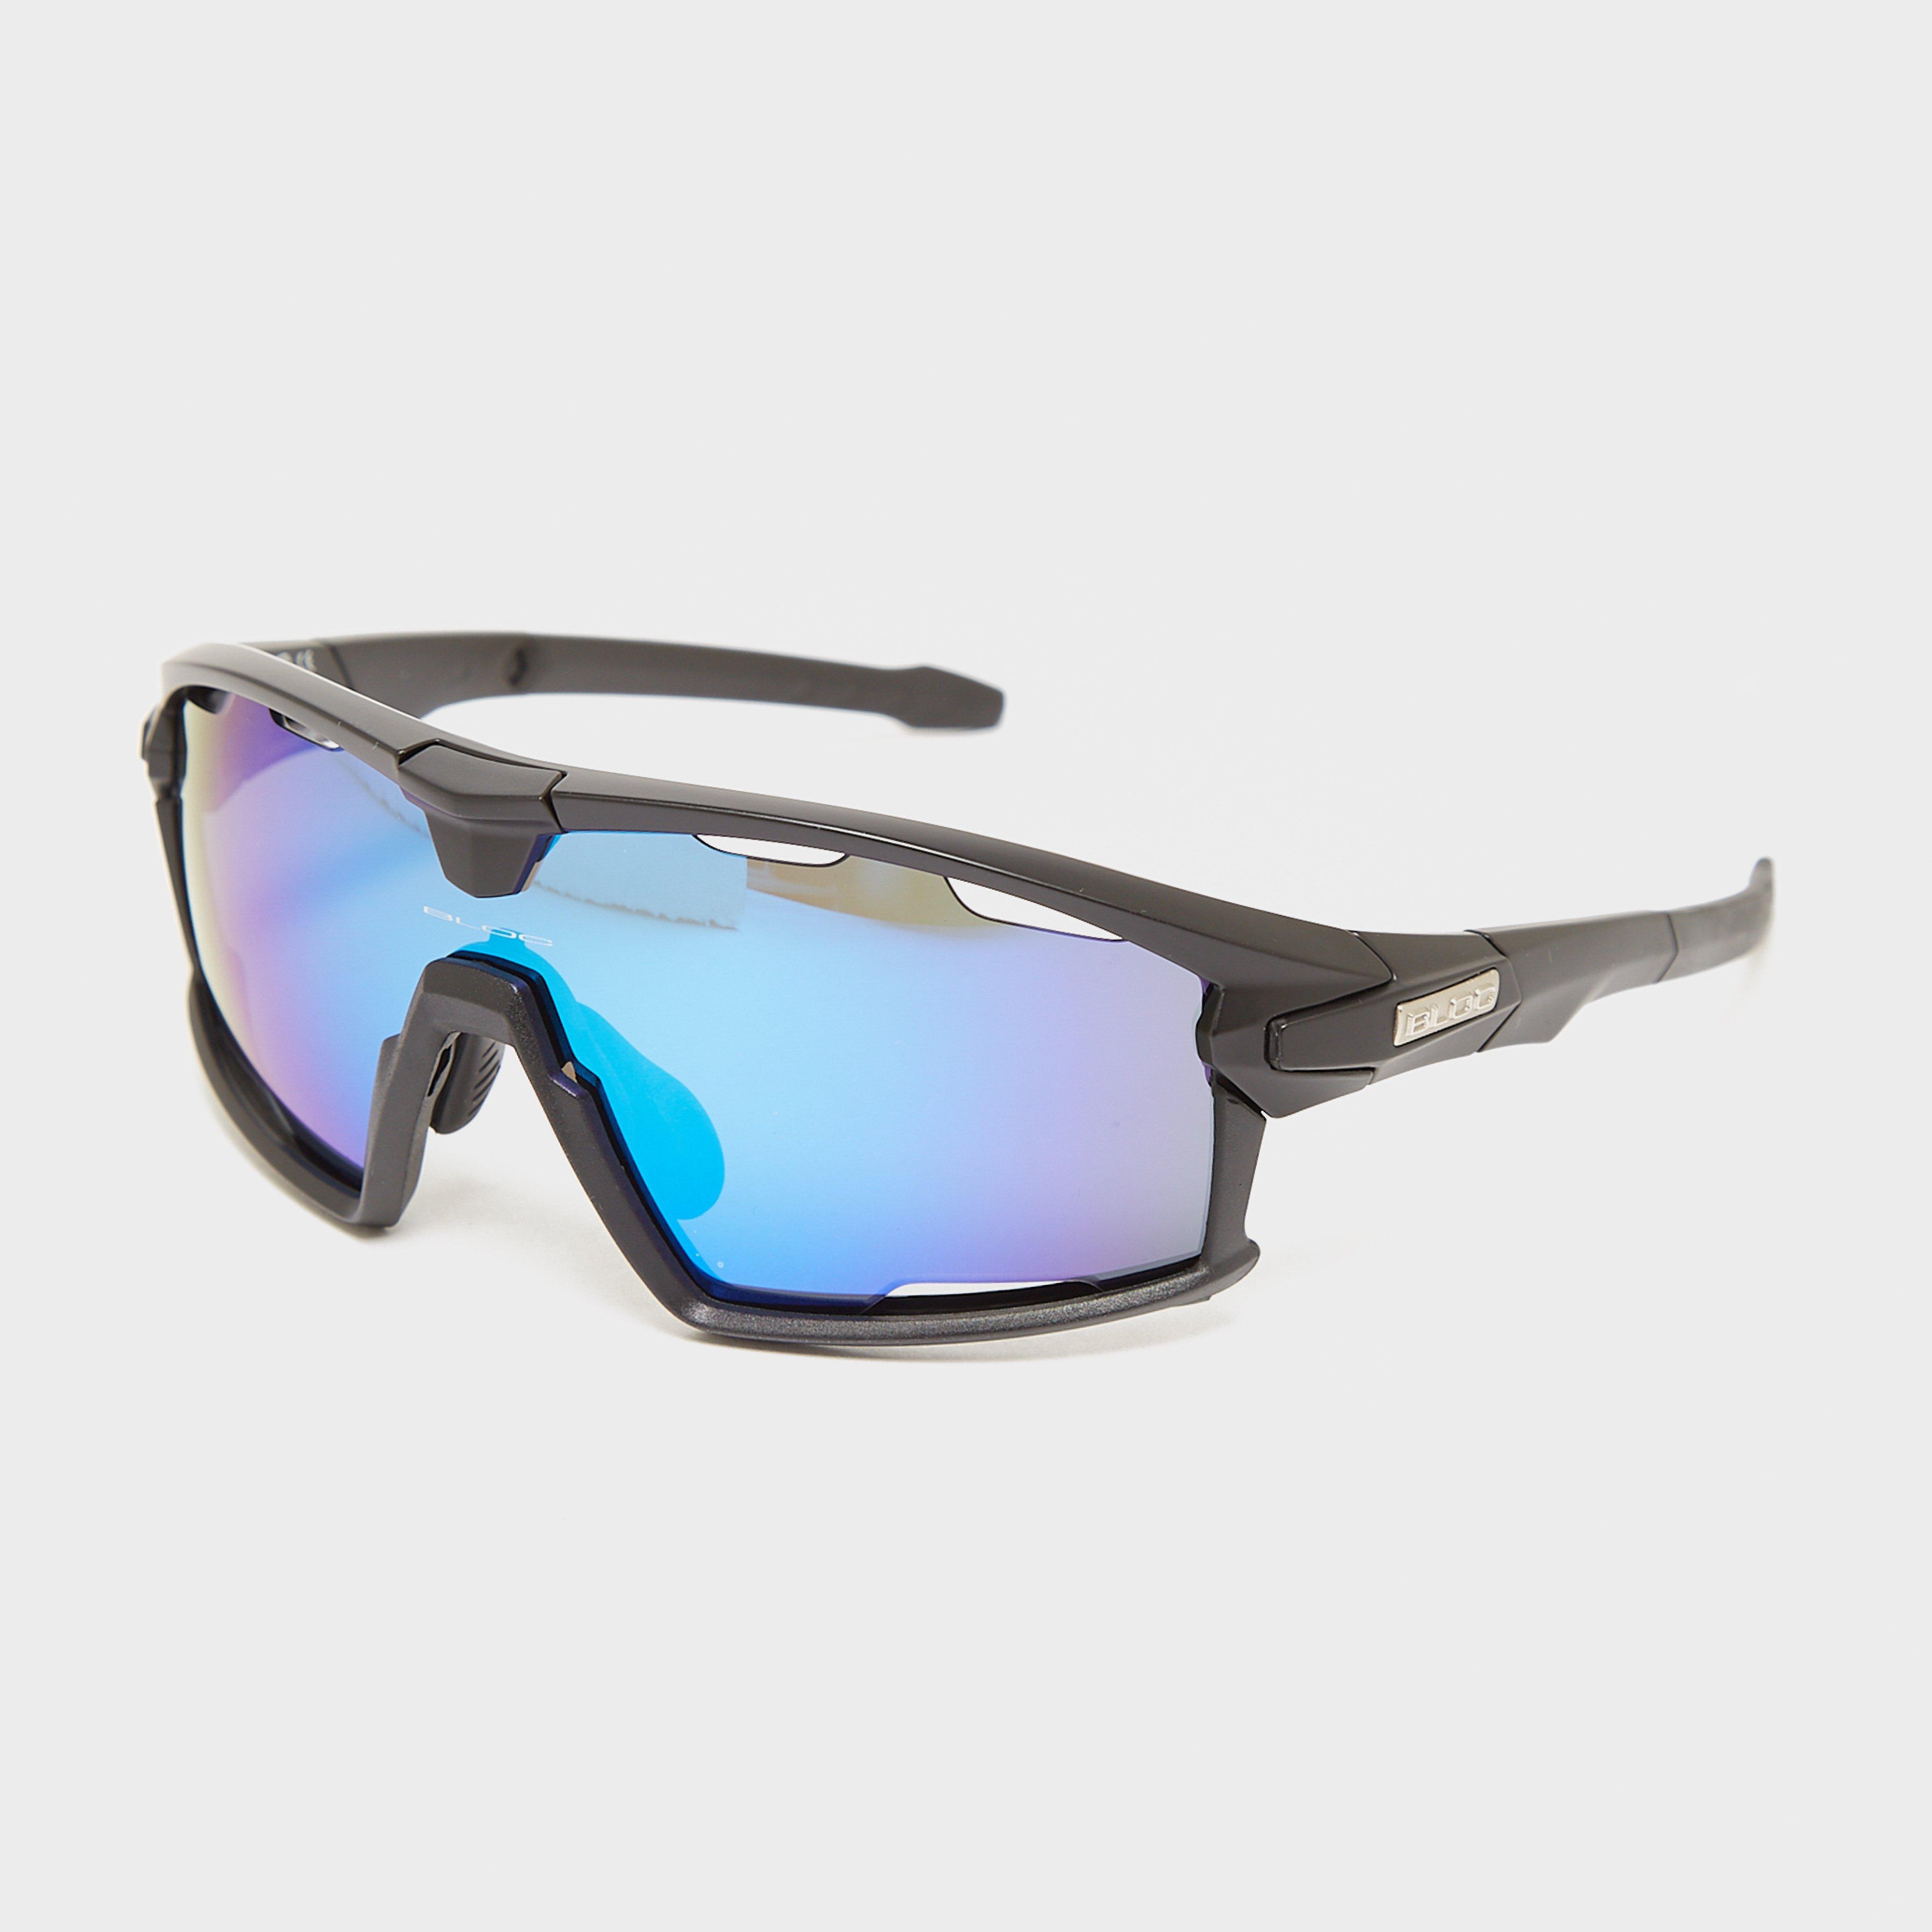 Bloc Forty X860 Sunglasses - Black/xb860  Black/xb860